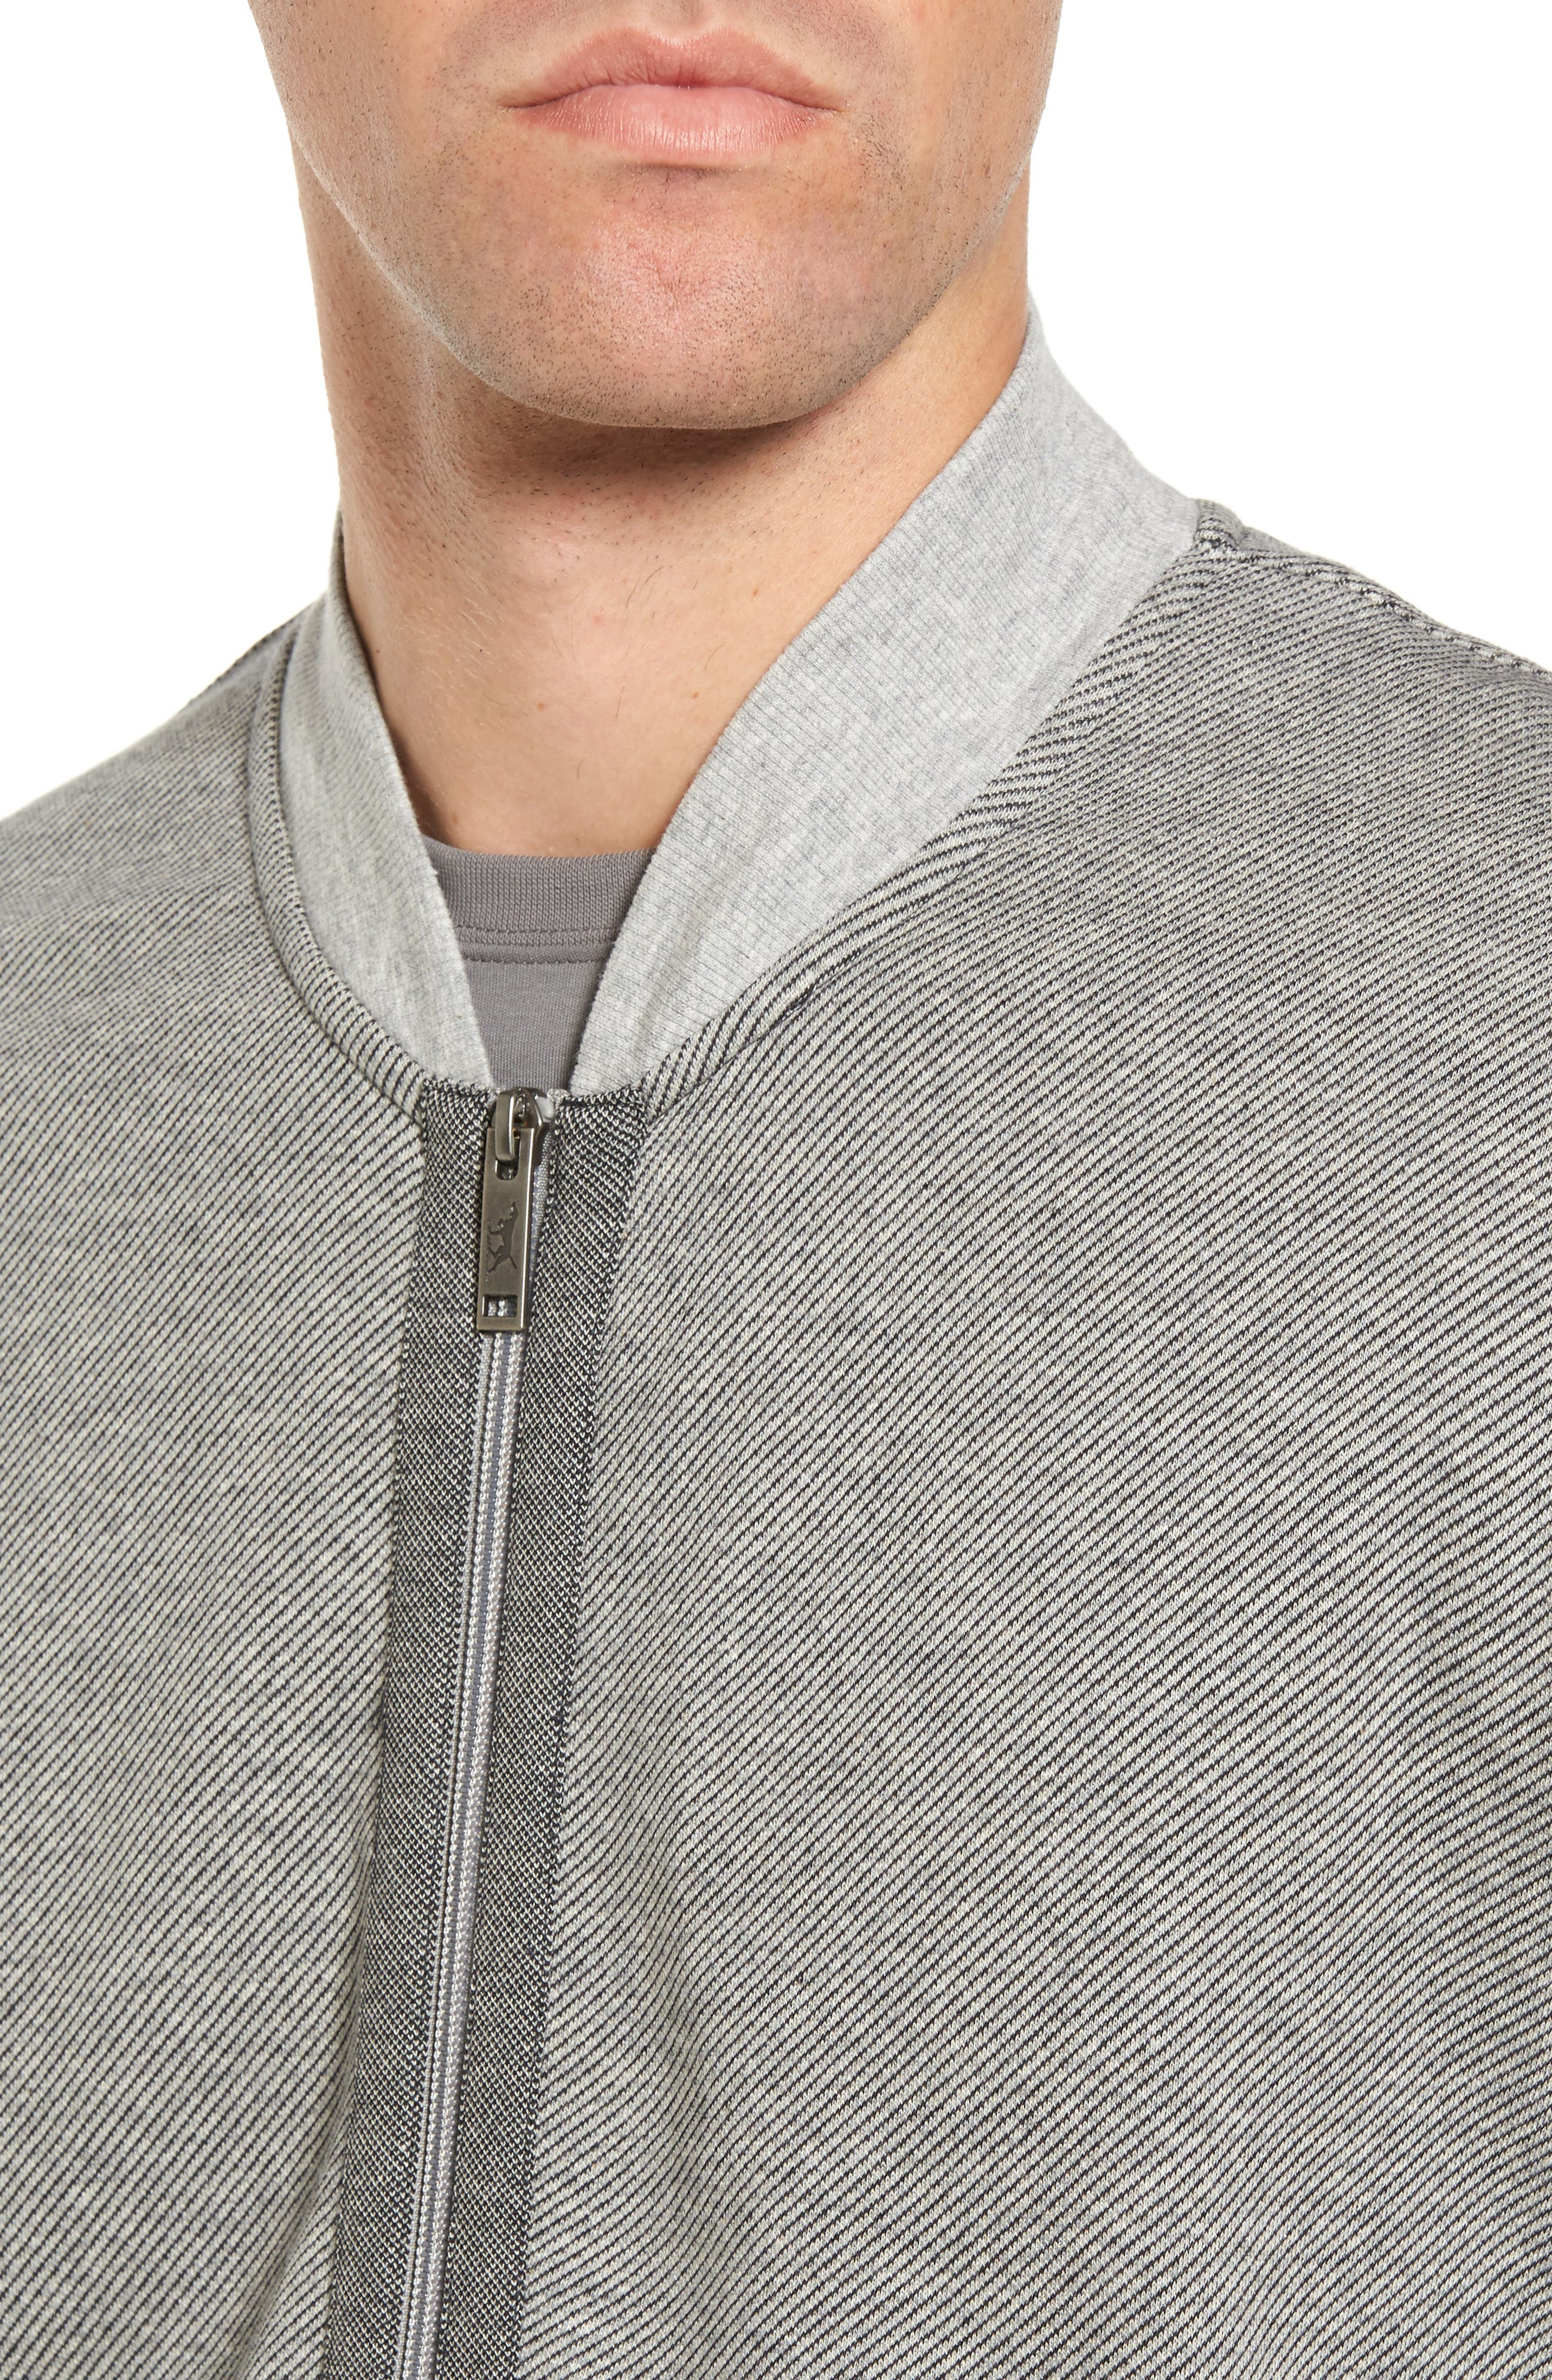 Alderson Ave Fleece Jacket,                             Alternate thumbnail 4, color,                             020